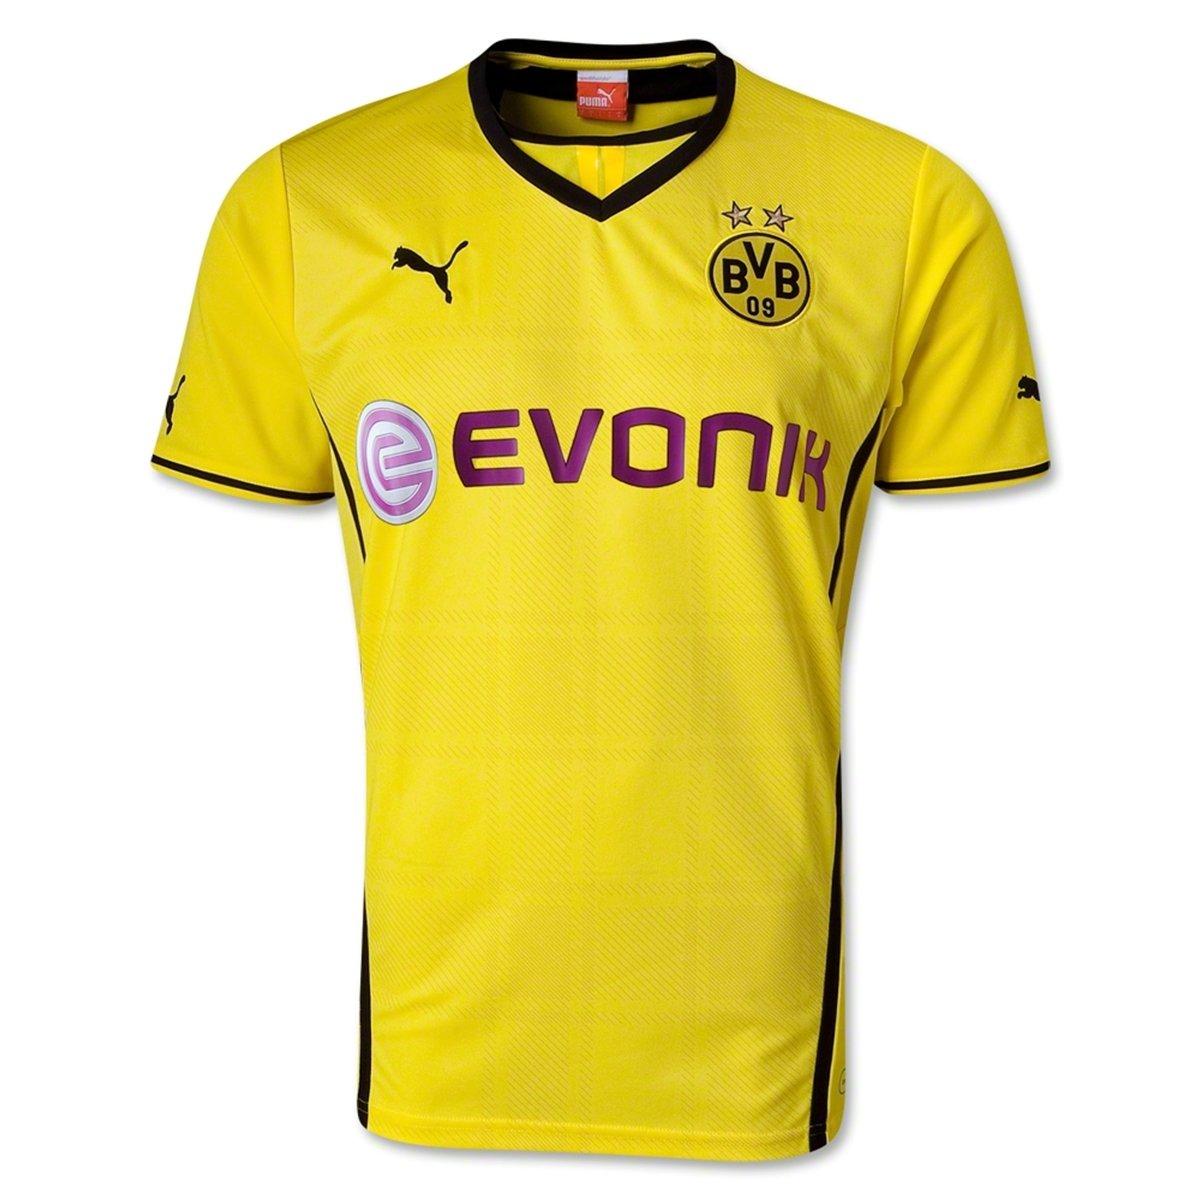 PUMA Mens BVB Borussia Dortmund Home Soccer Stadium Jersey